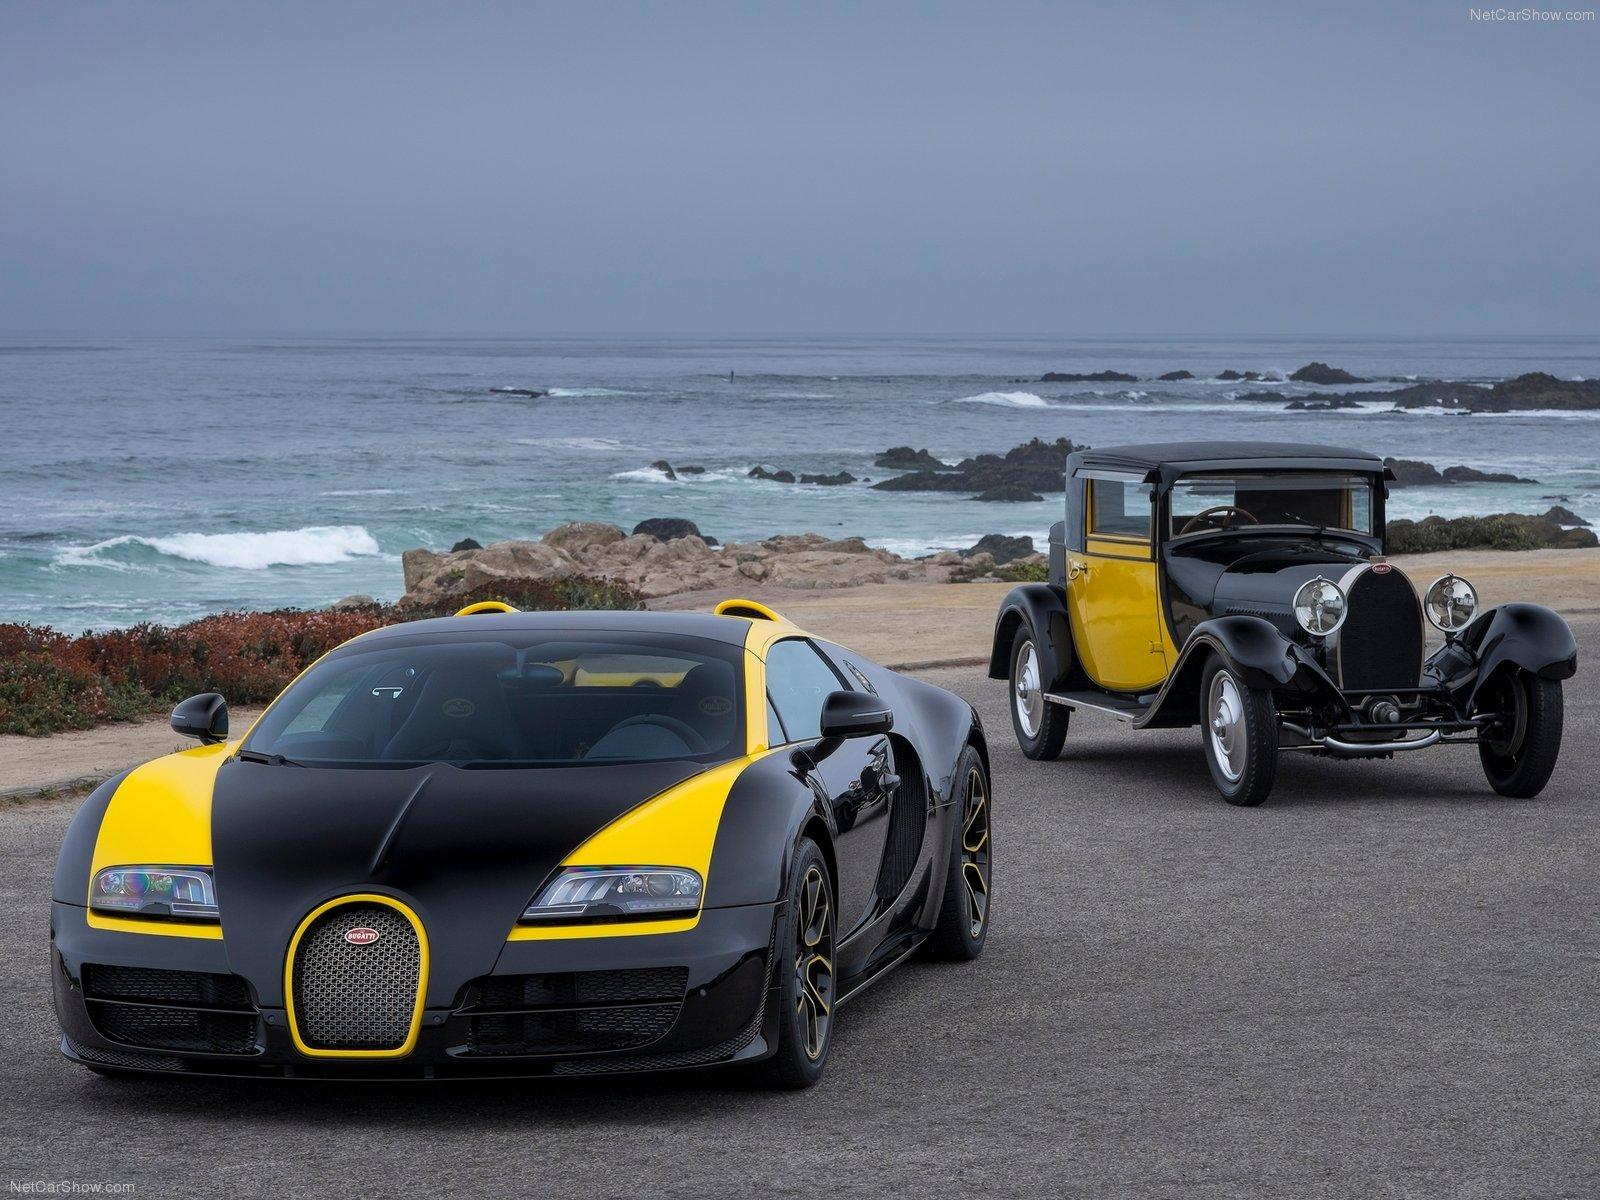 2014%2BBugatti%2BVeyron%2BGrand%2BSport%2BVitesse%2B1of1%2B%25283%2529 Astounding Xe Bugatti Veyron Grand Sport Vitesse Cars Trend